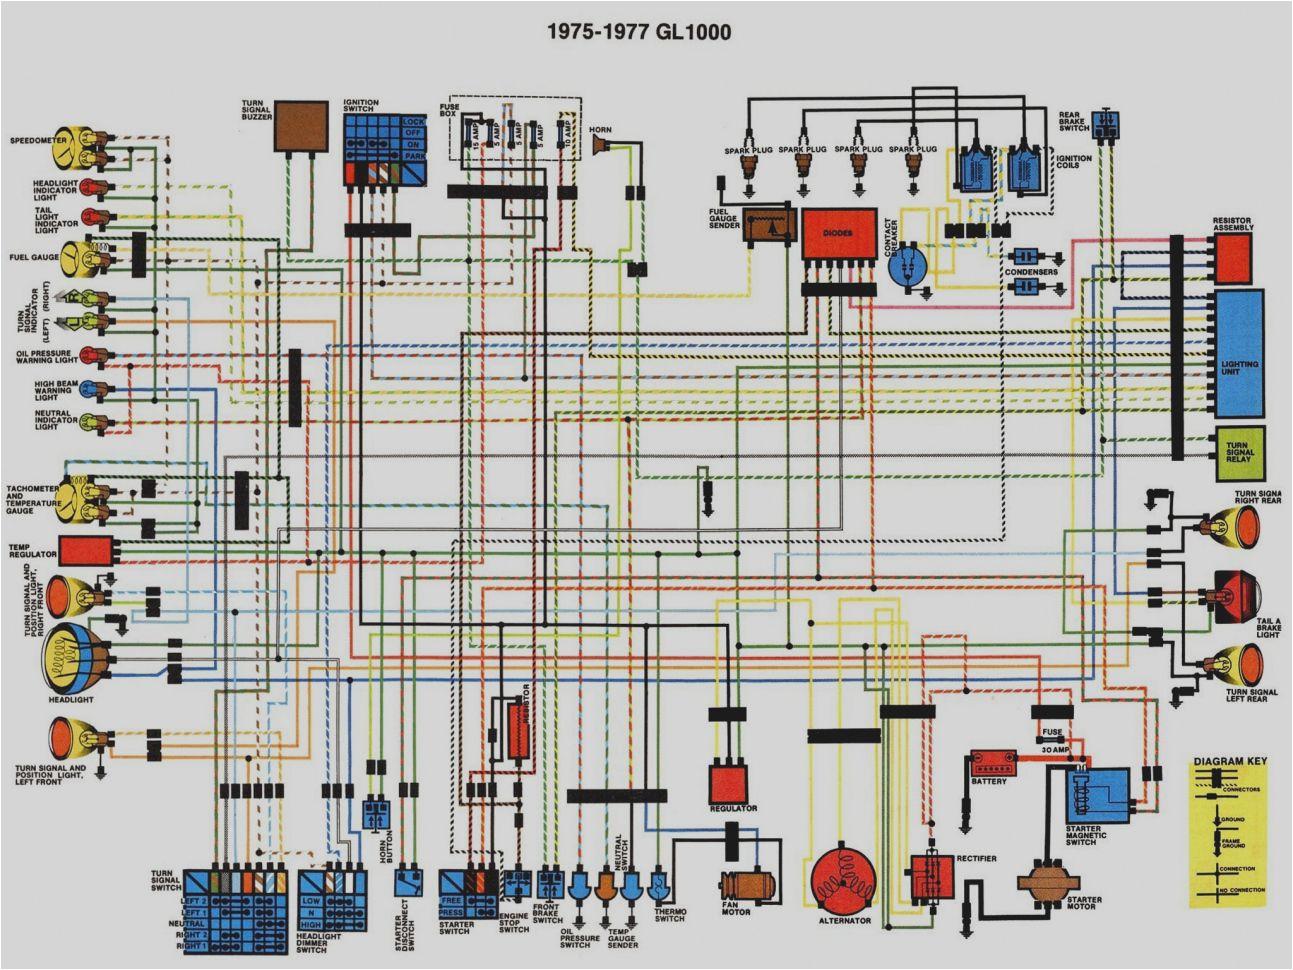 1985 honda gl1200 wiring diagram wiring diagram blog honda goldwing gl1200 wiring diagram gl1200 wiring diagram